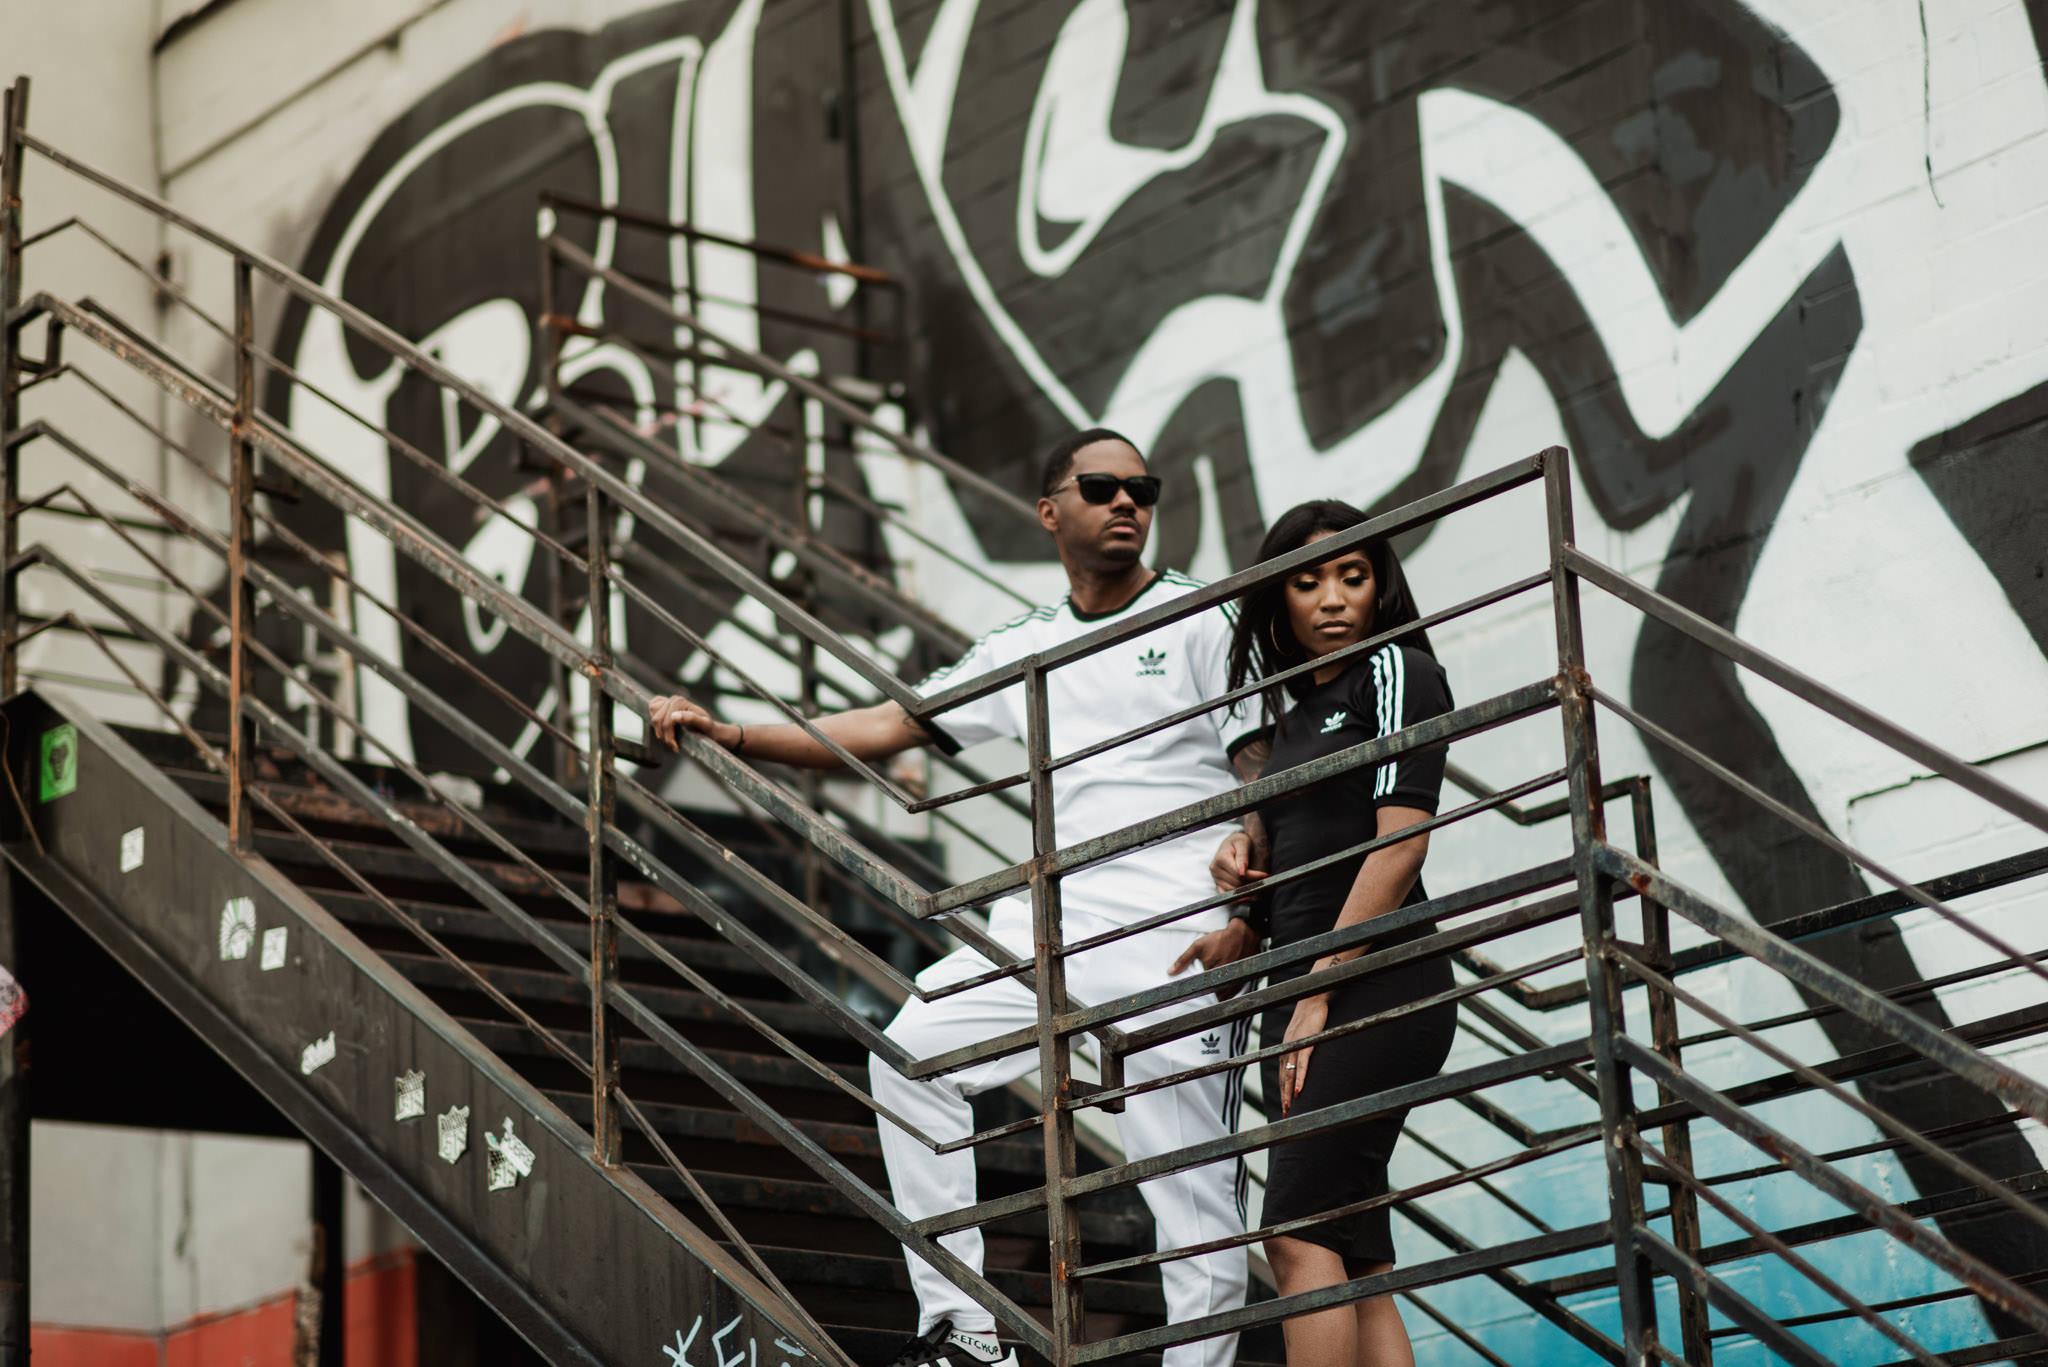 houston-style-classy-sporty-adidas-black-couple-engagement-graffiti-wall-photographer